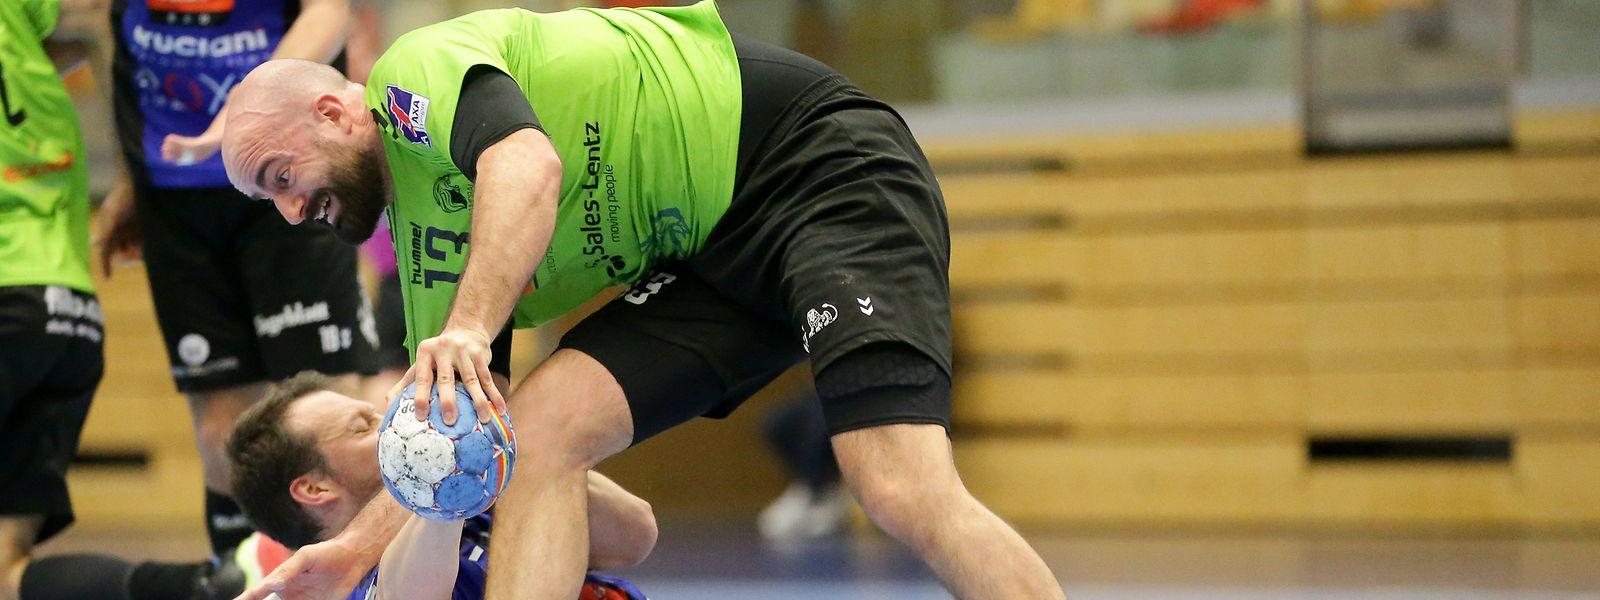 Düdelingens Dan Mauruschatt im Zweikampf mit Tommaso Cosanti (unten), der mit Käerjeng eine große Chance verpasst.